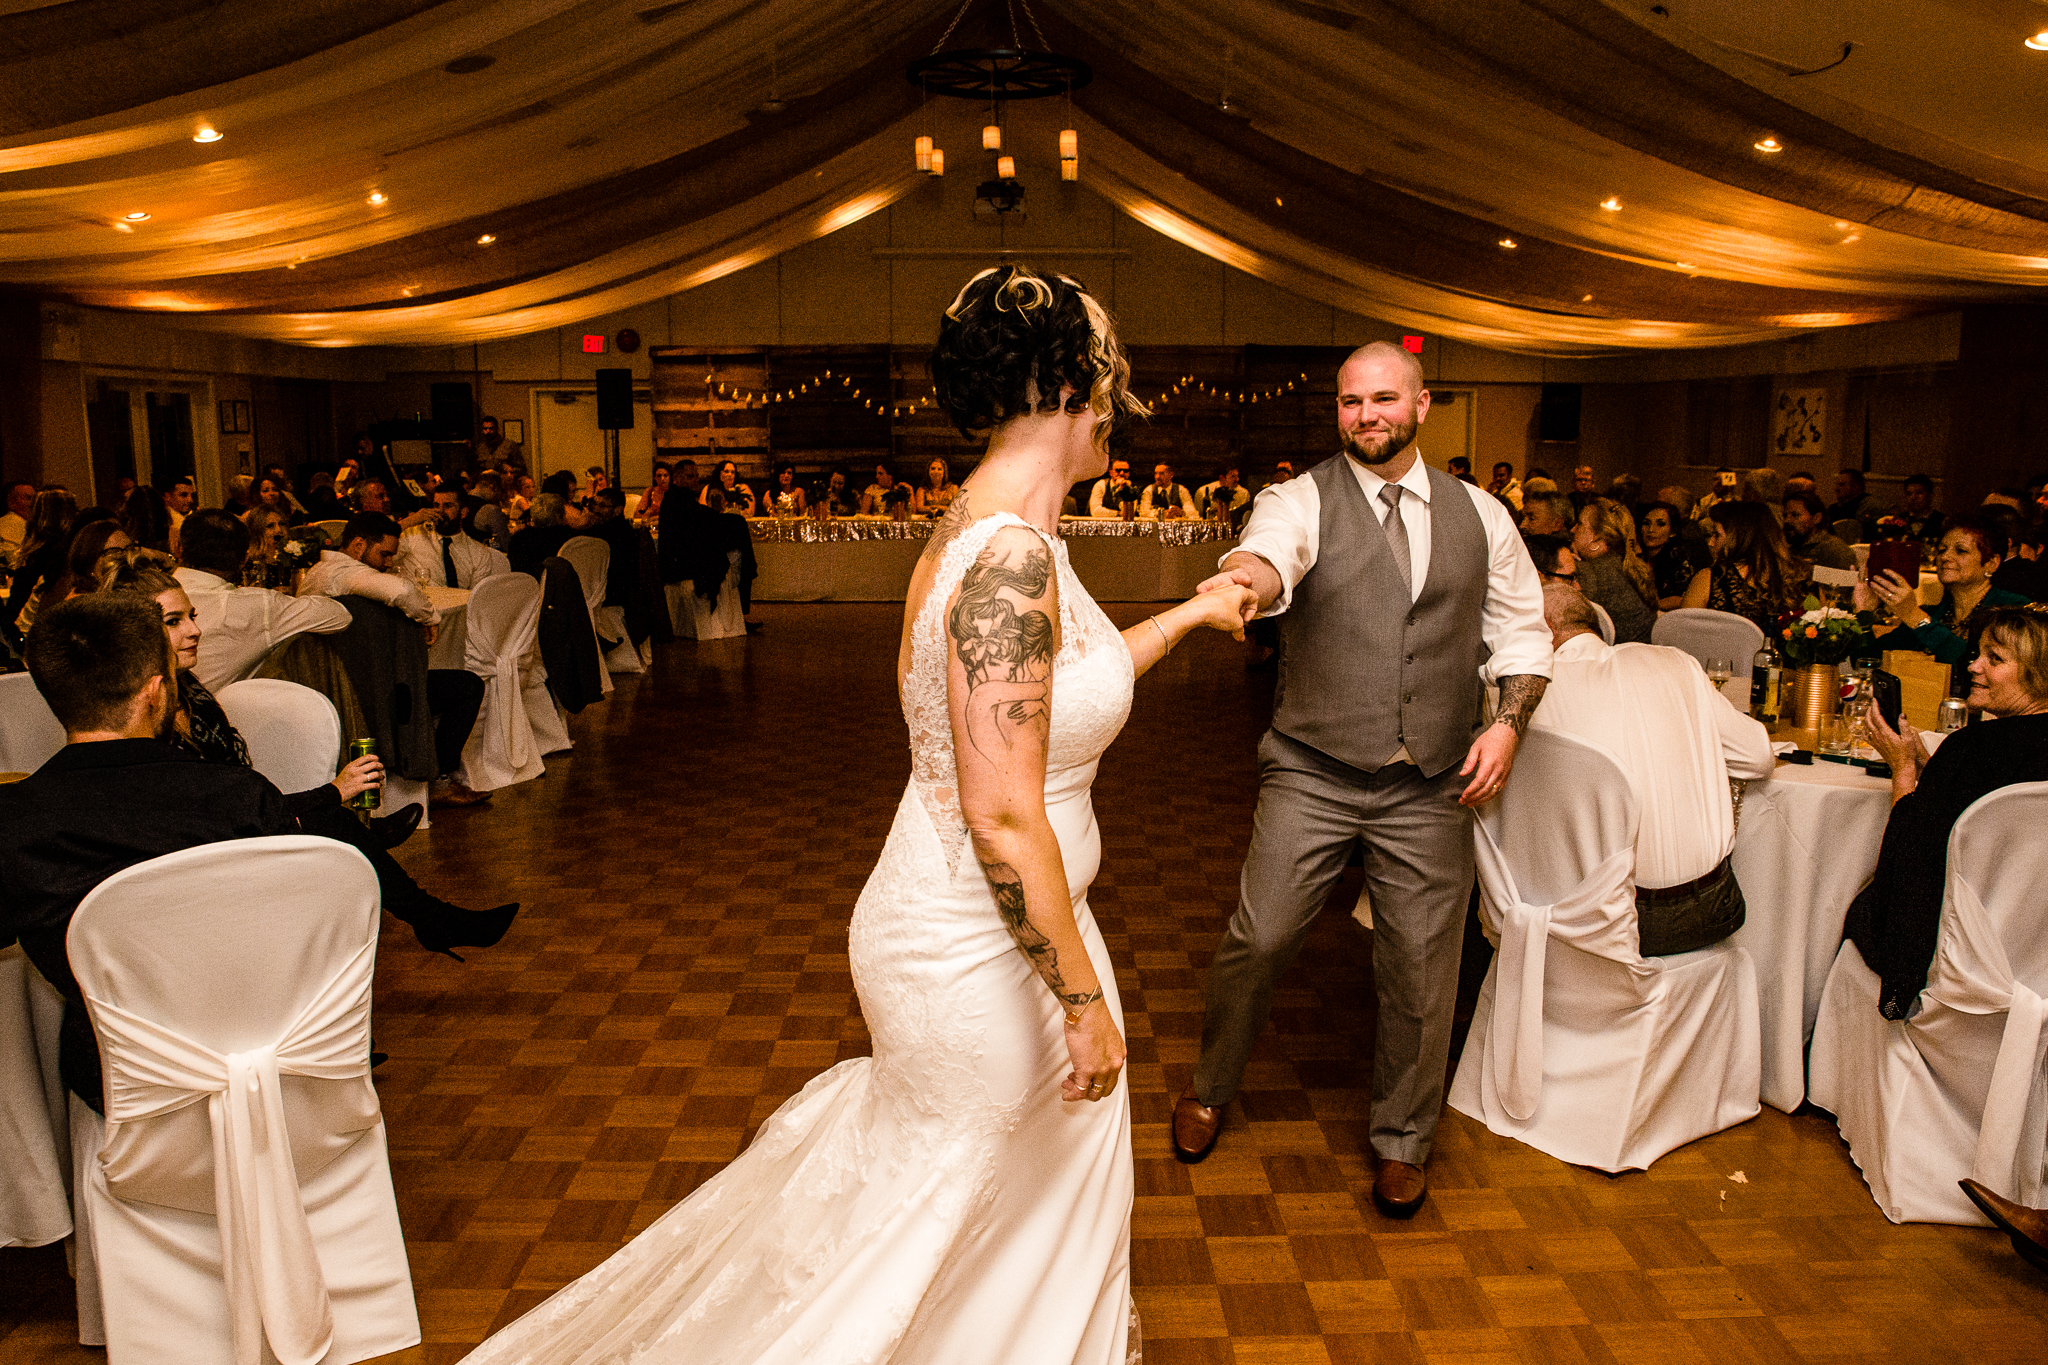 langley wedding photographer best -004.jpg